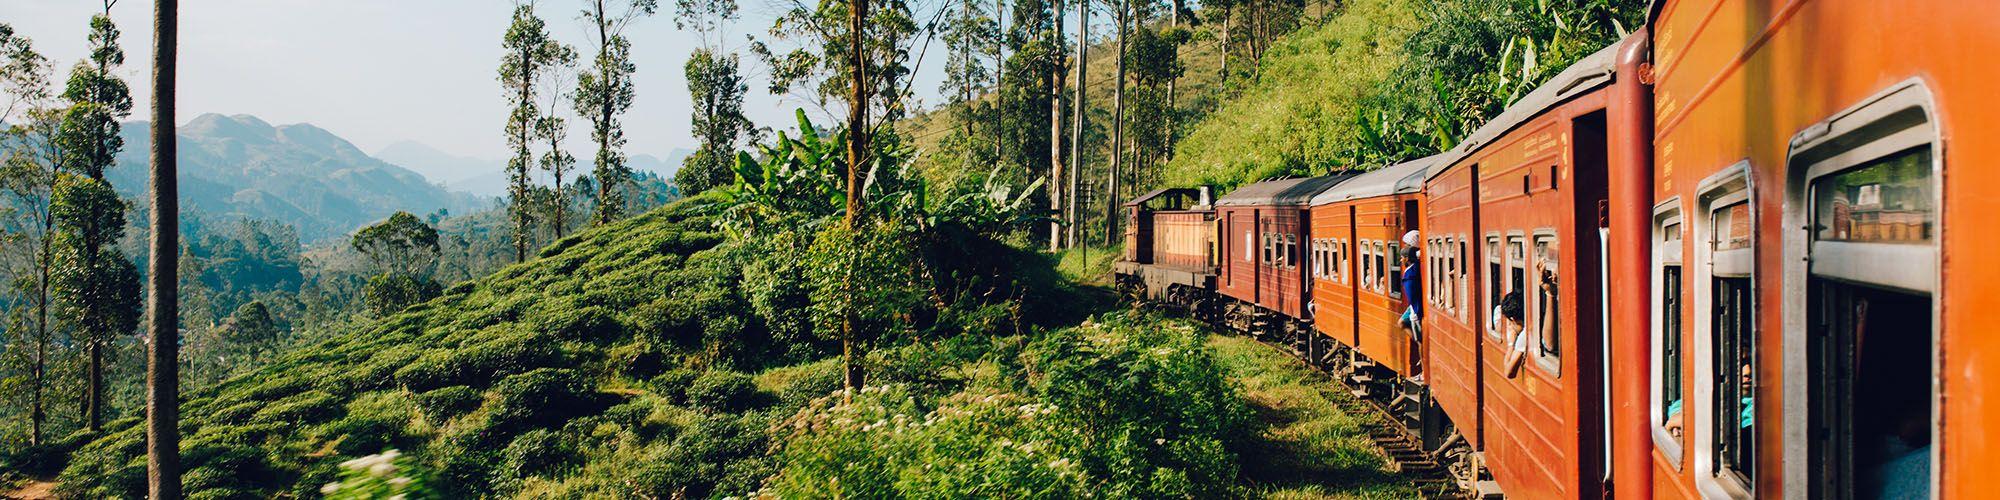 Sri Lanka, Kandy, Train, Landscapes